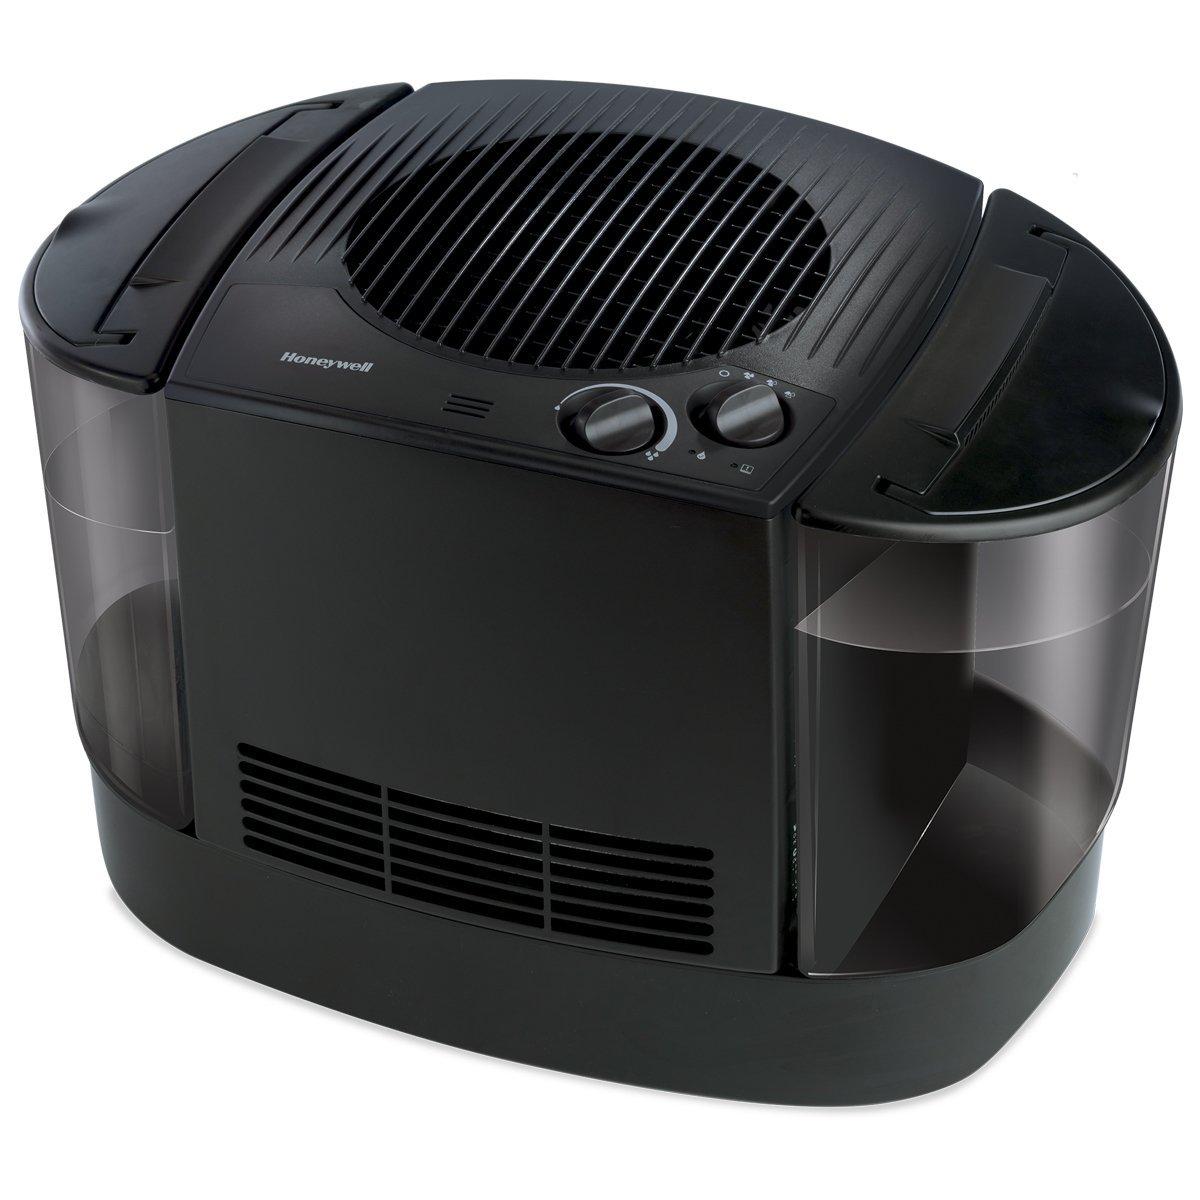 Honeywell HEV685B Top Fill Console Humidifier, Black